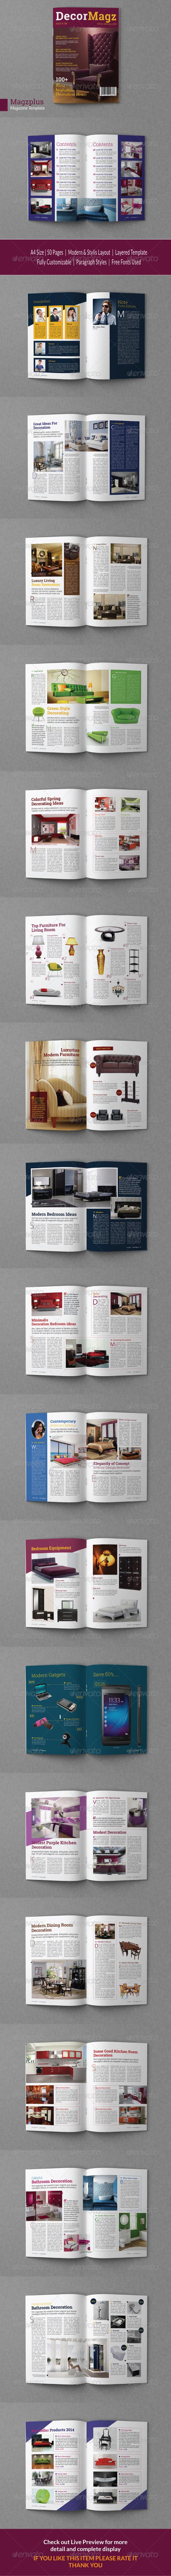 Decormagz_Magazine_Template - Magazines Print Templates